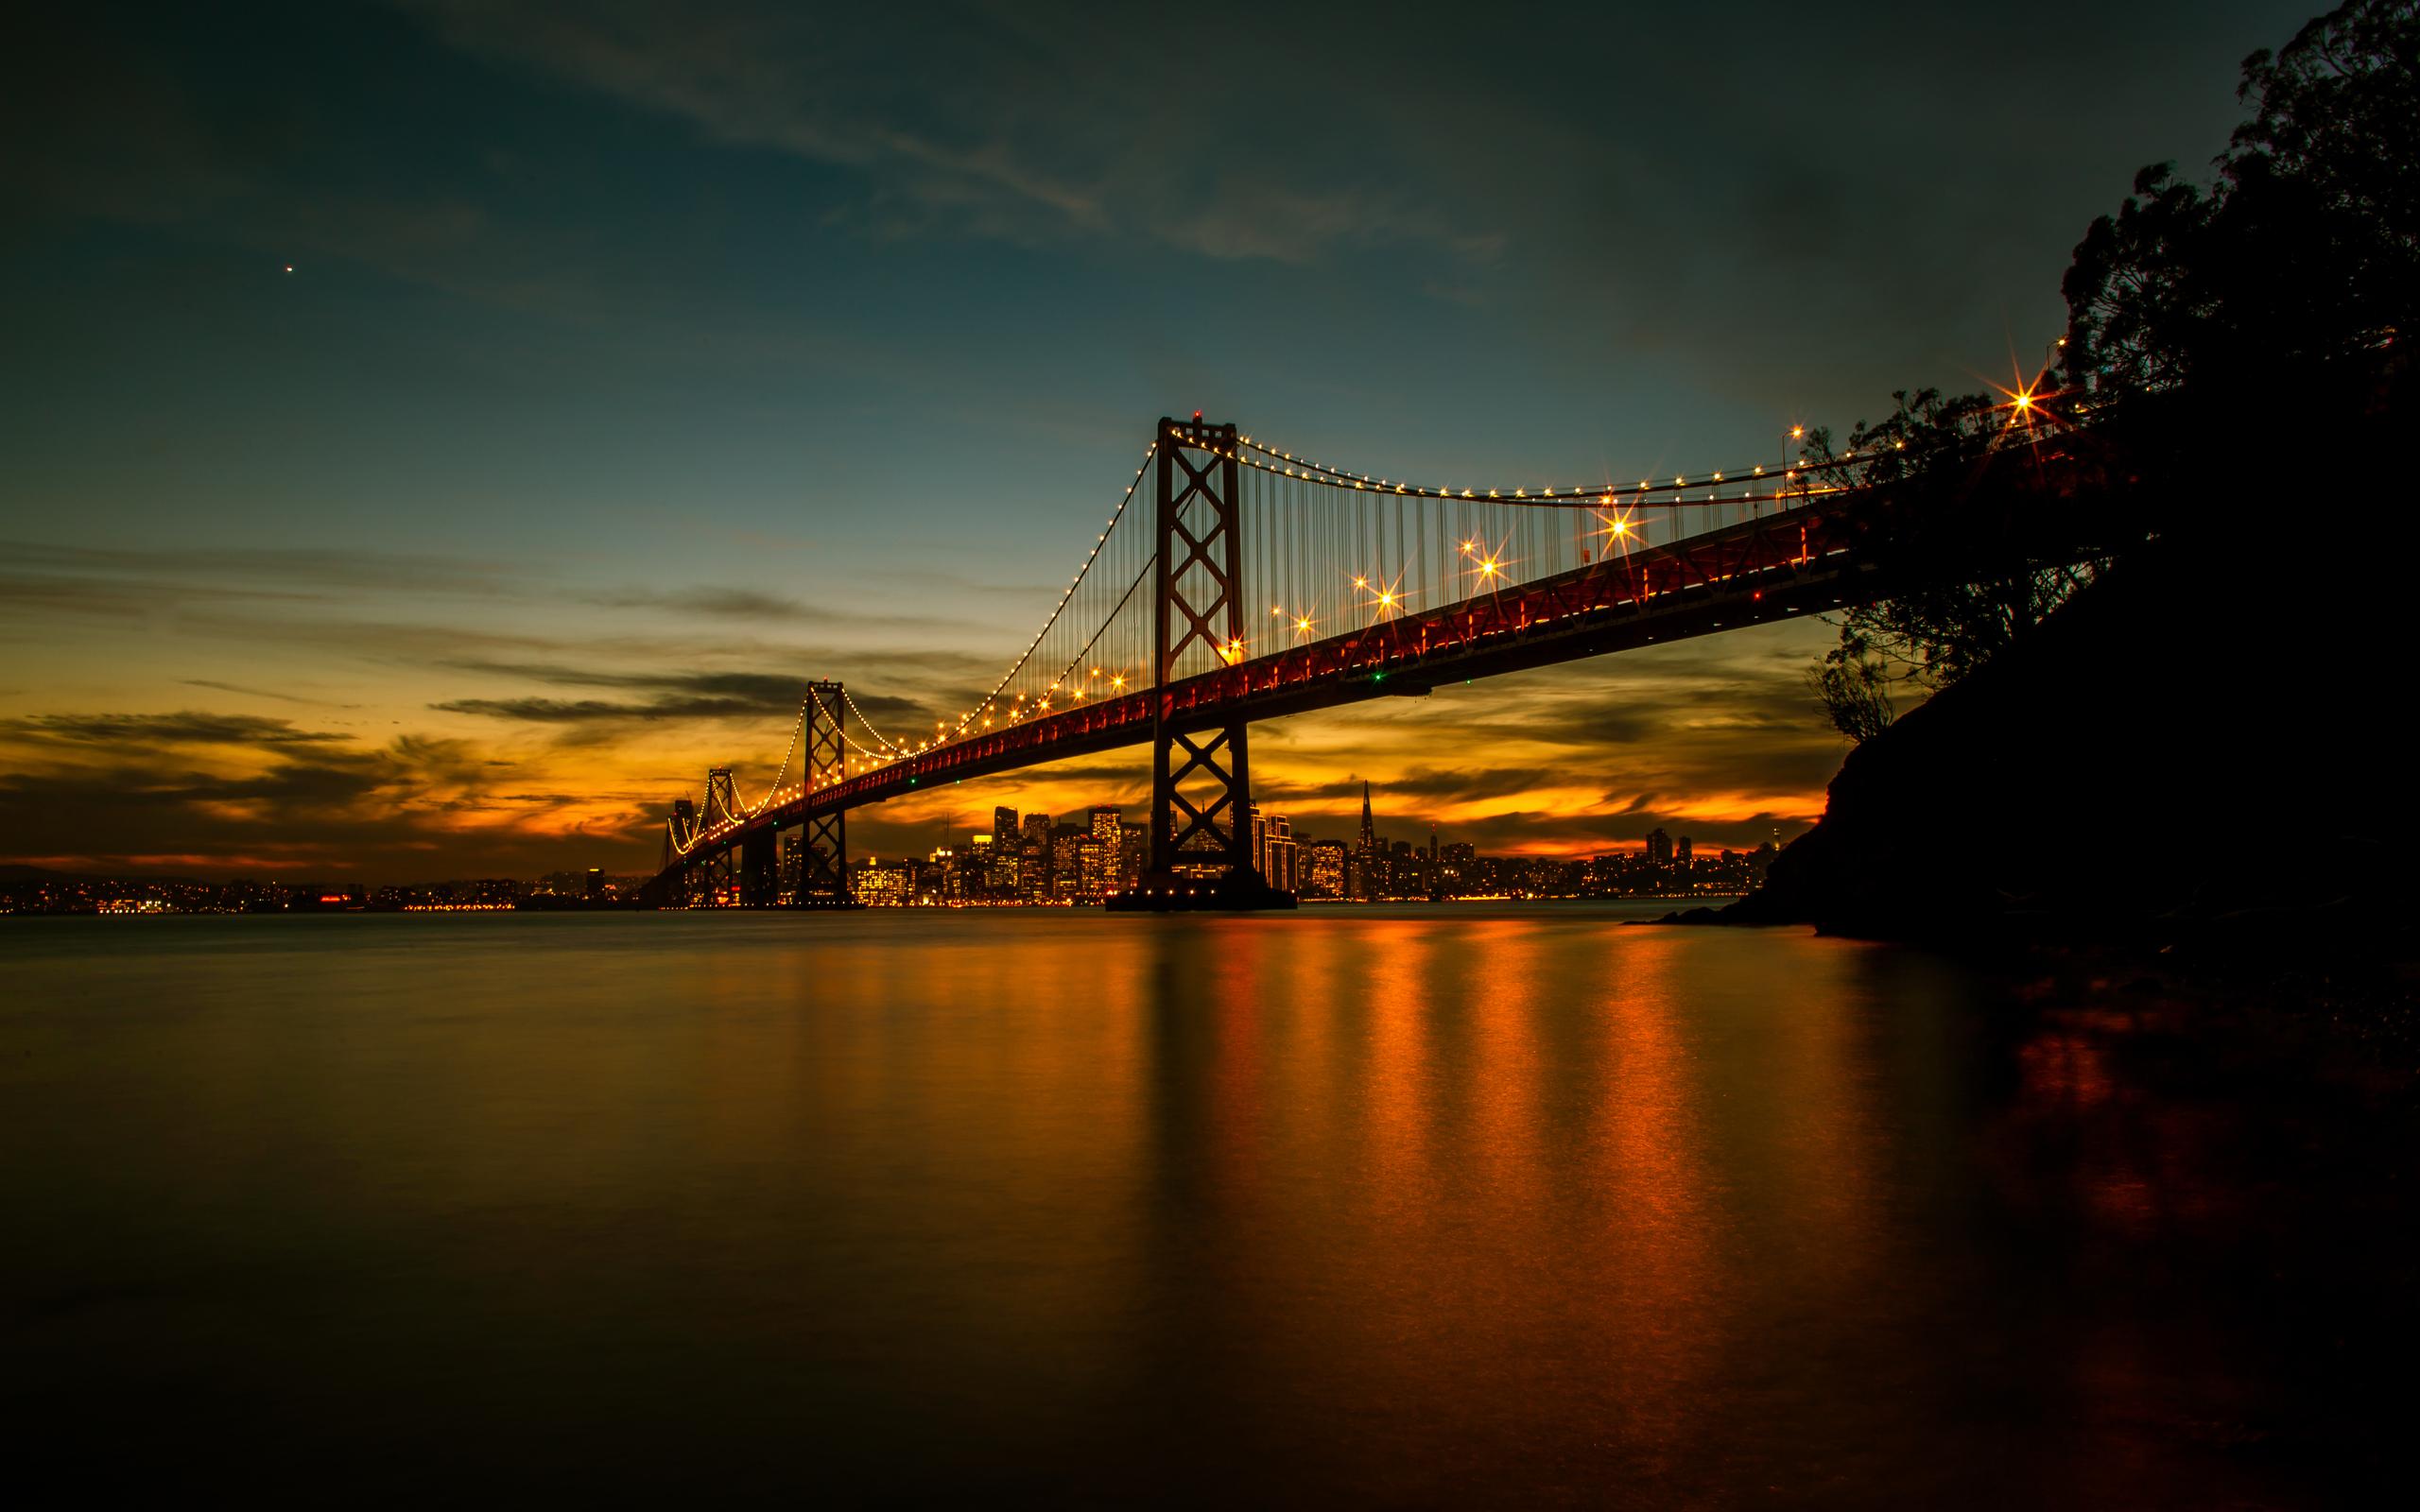 san-francisco-bay-bridge-5k-17.jpg